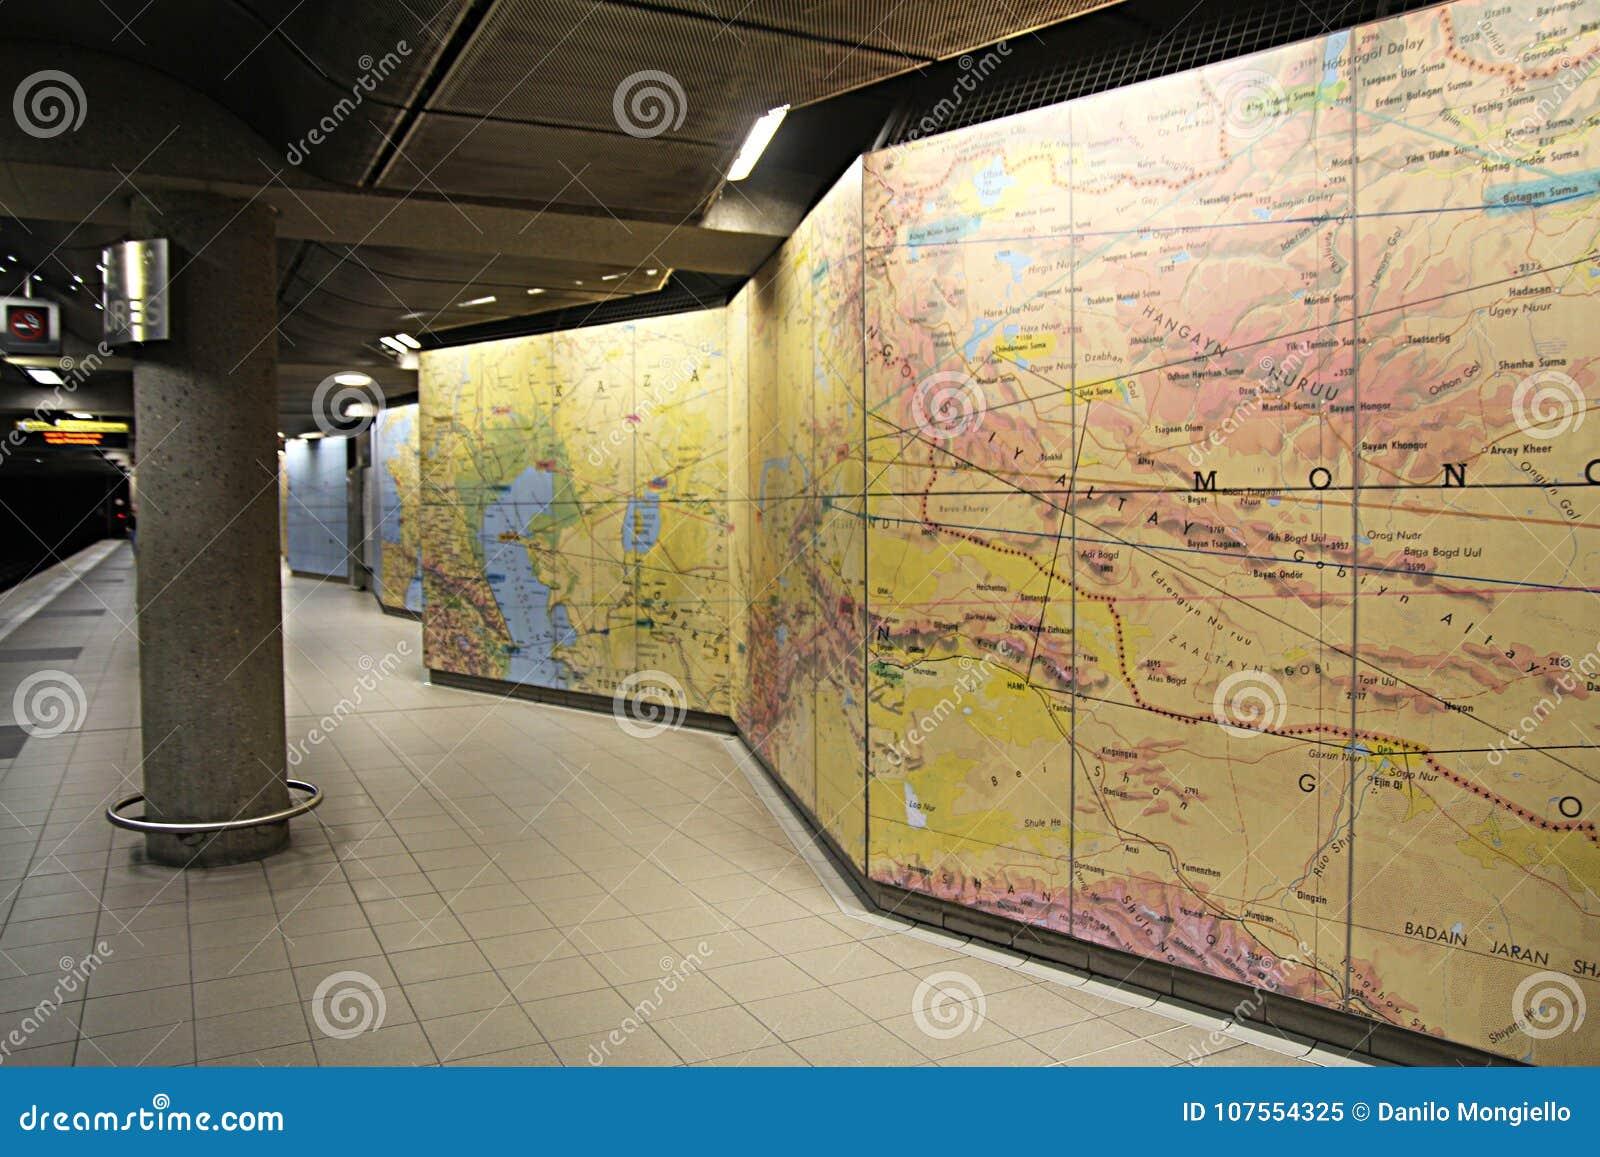 Lyon France Metro Map.Underground Map Stock Image Image Of Rail Modern Travel 107554325